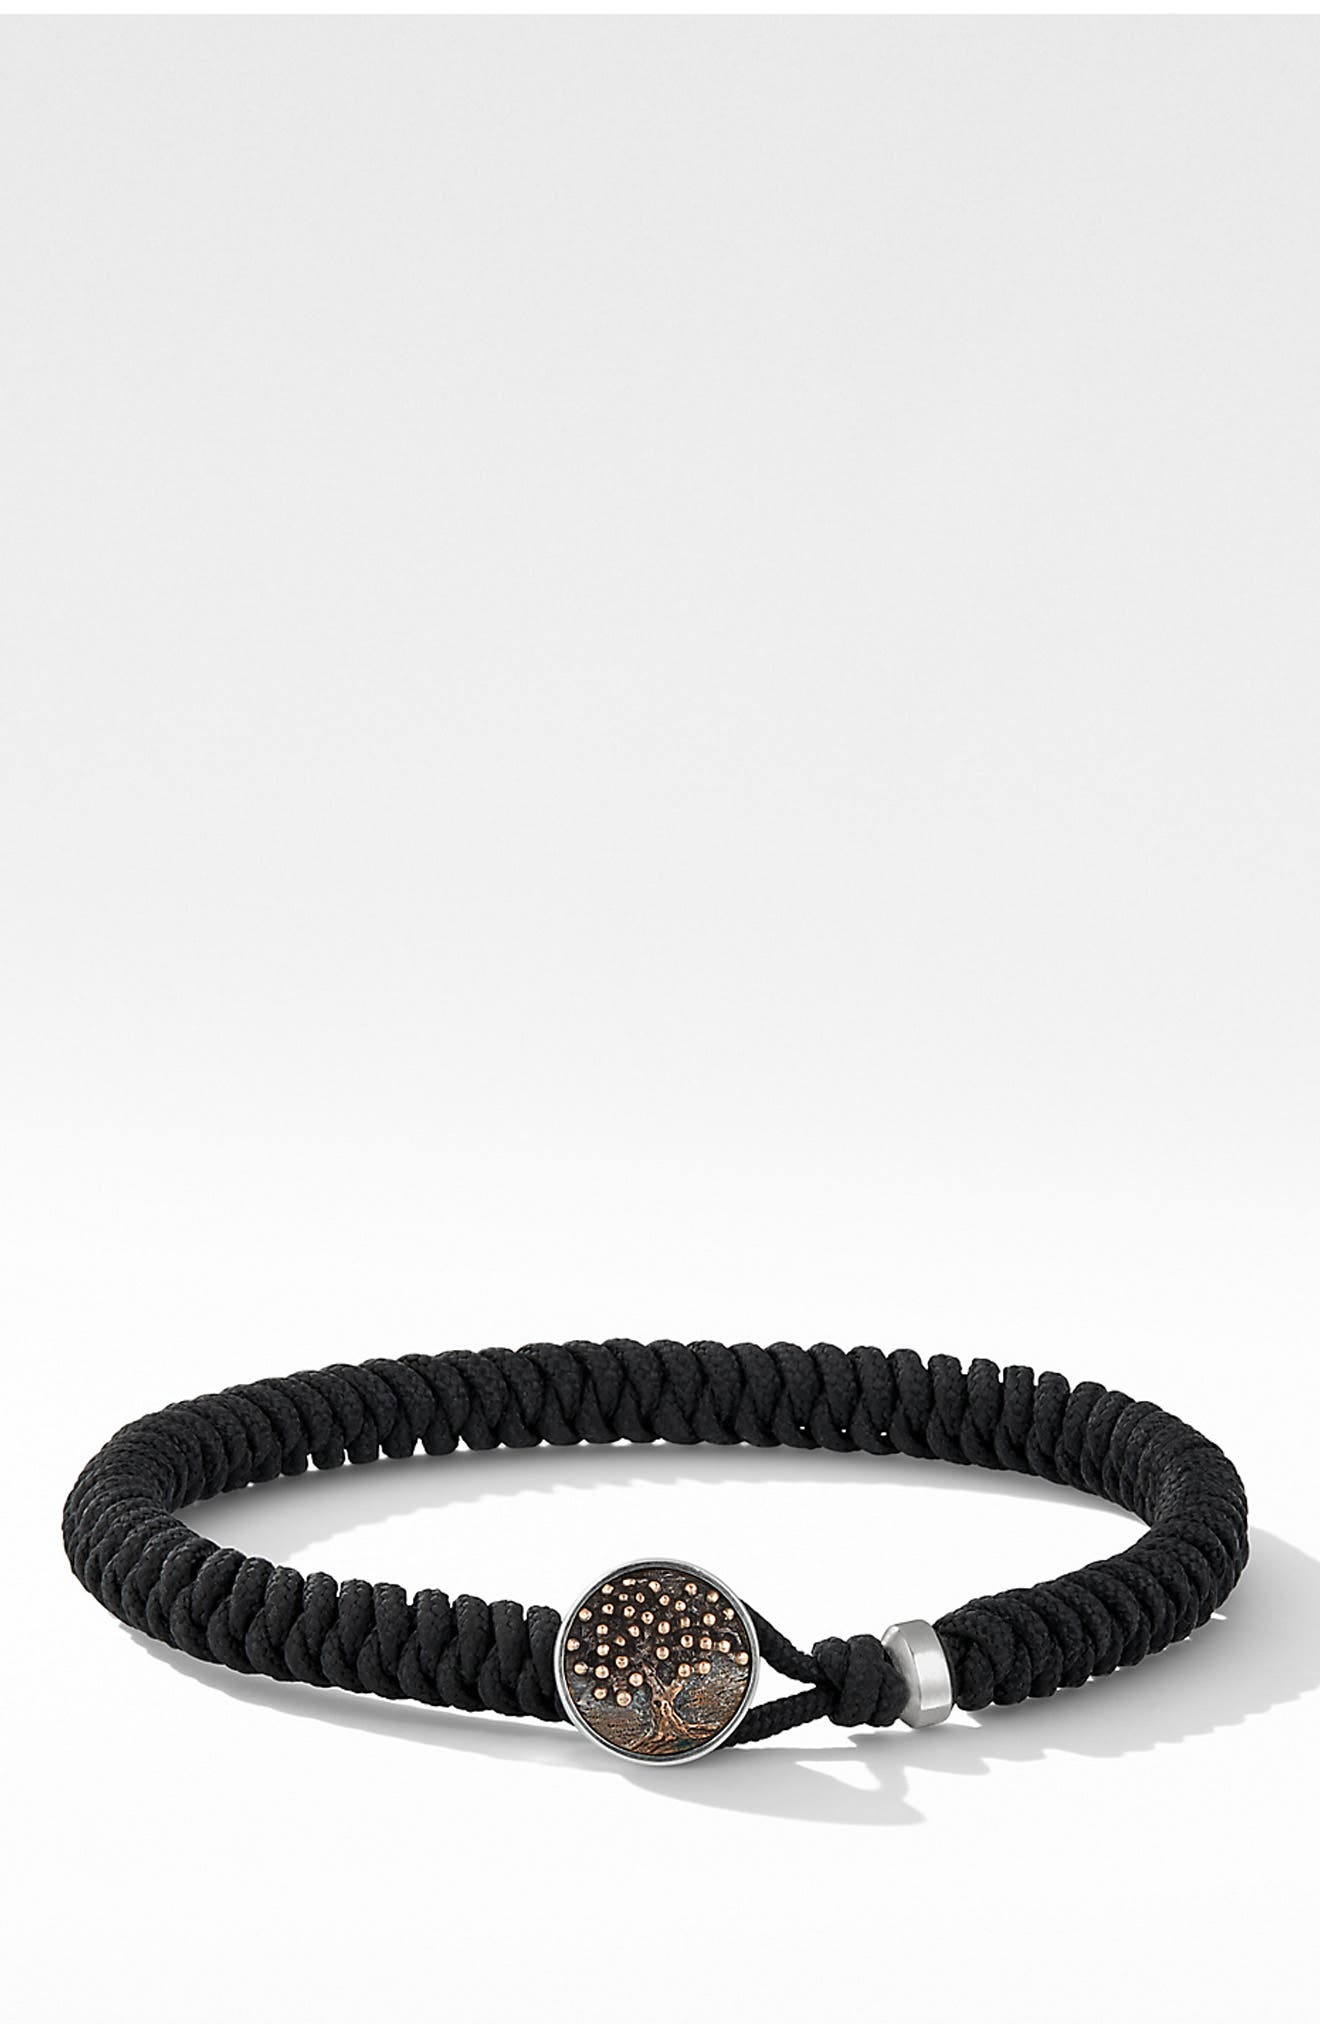 DAVID YURMAN Woven Tree of Life Bracelet, Main, color, BLACK